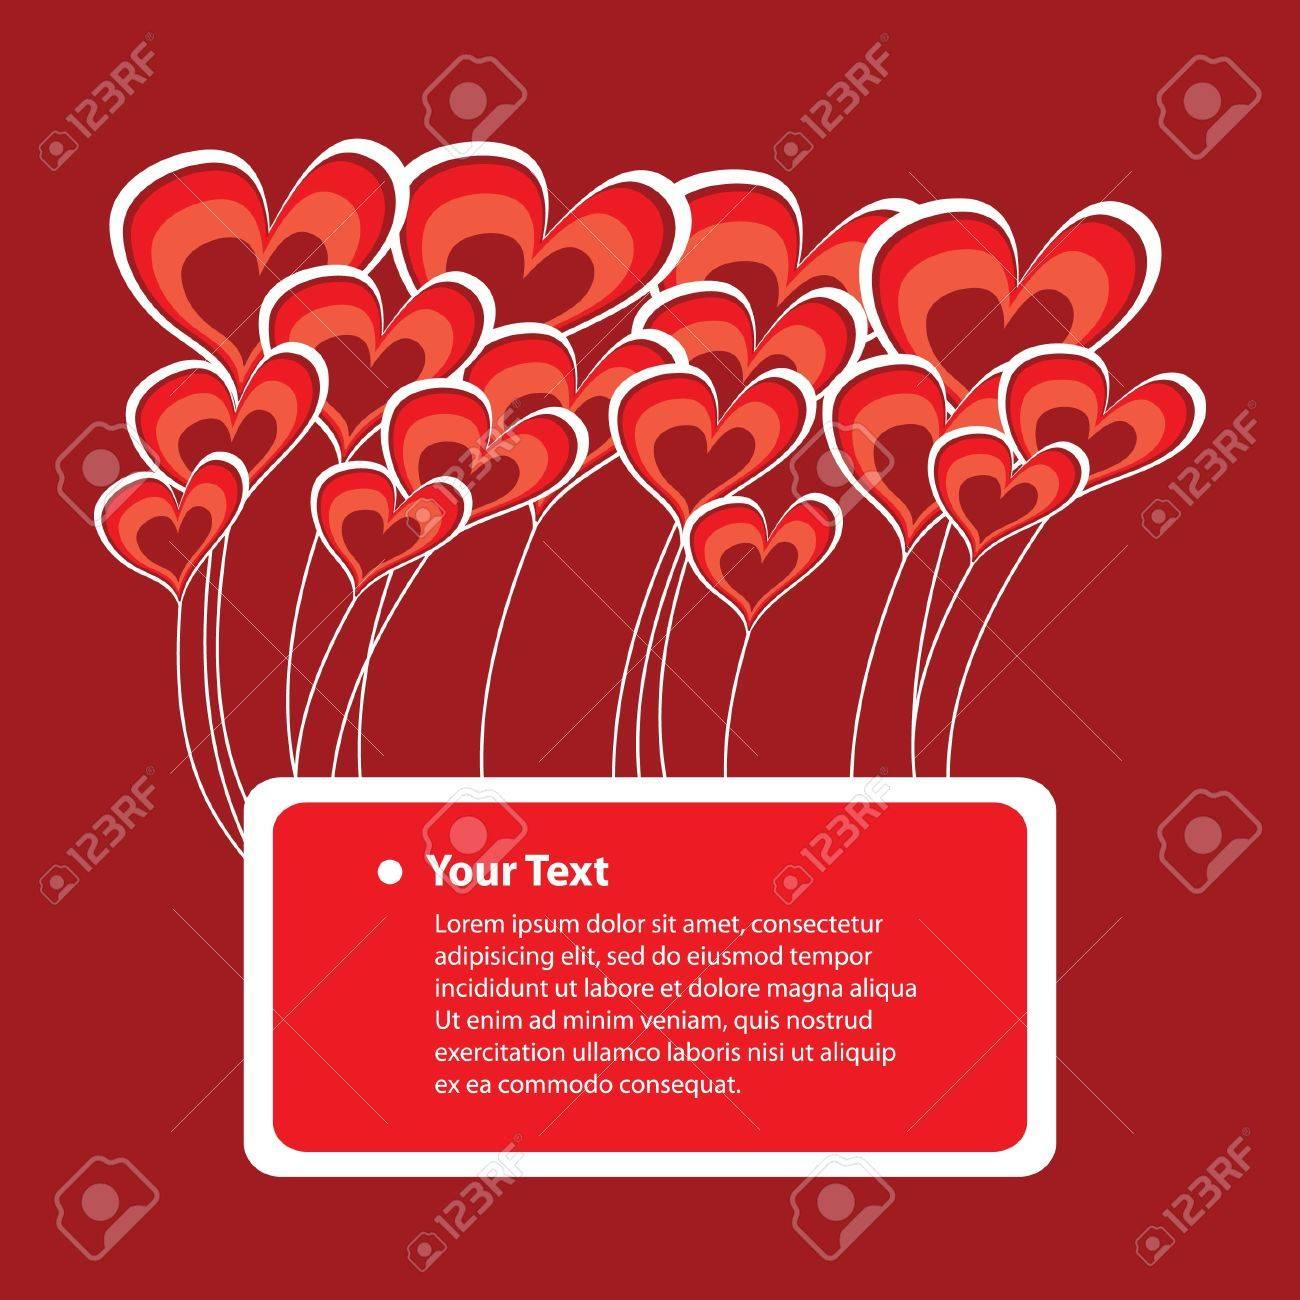 Congratulatory Card with Abstract Heart Vectors Stock Vector - 10711382